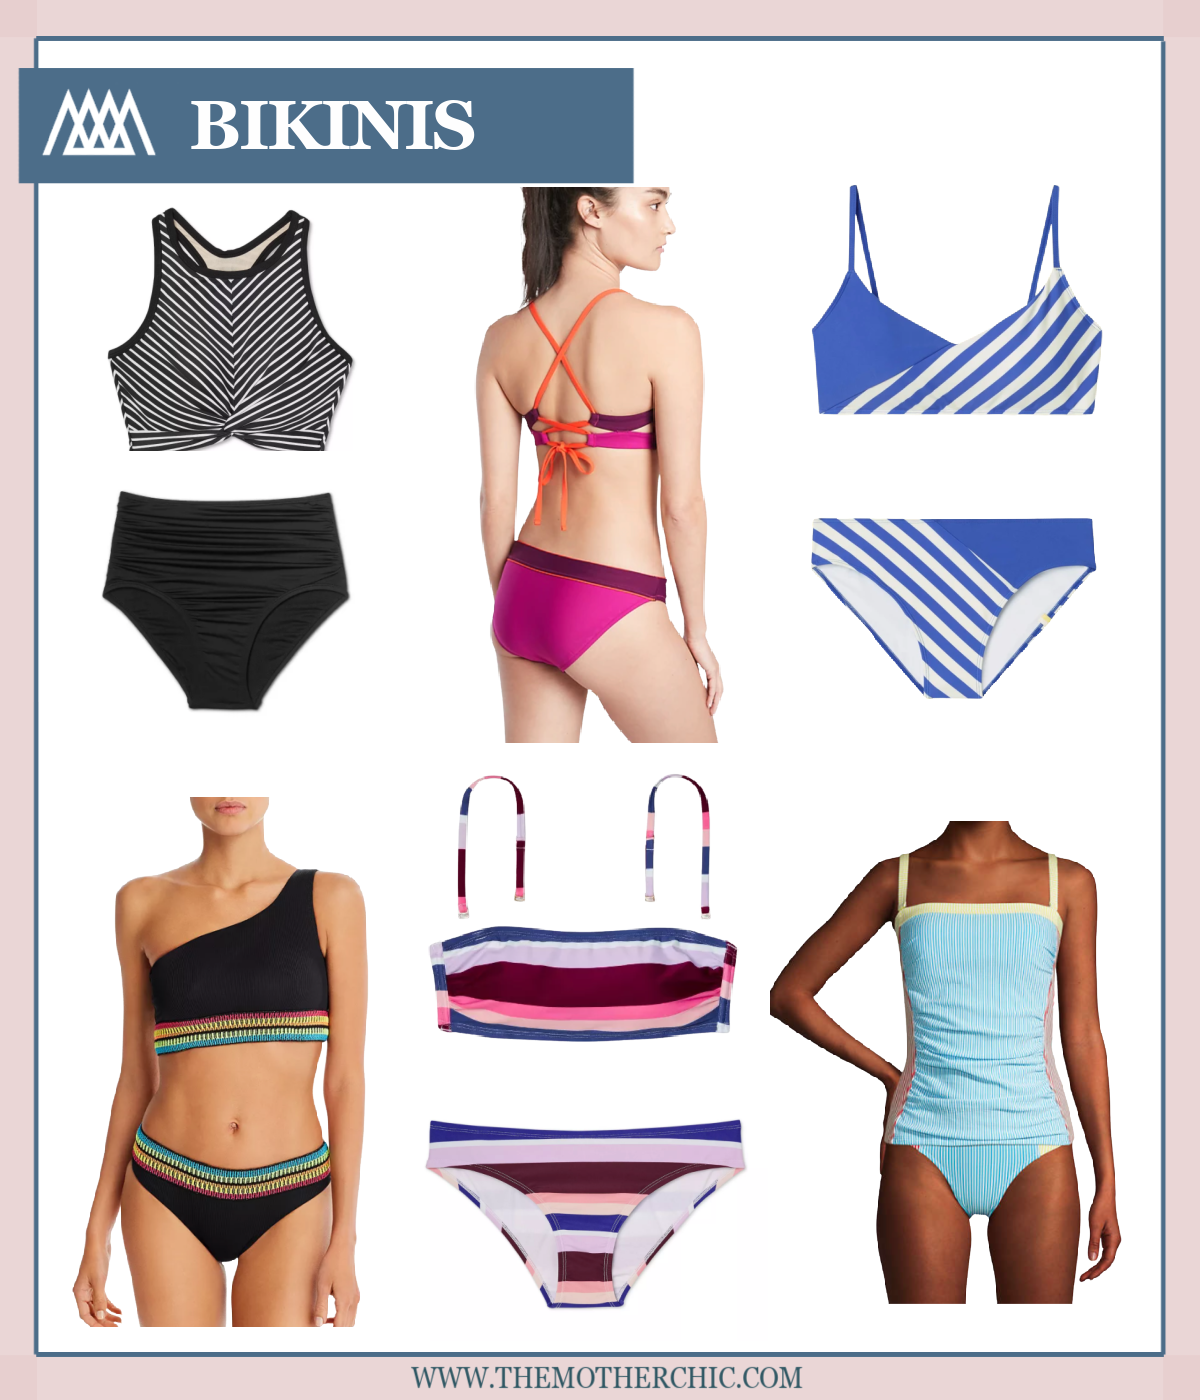 the motherchic bikinis